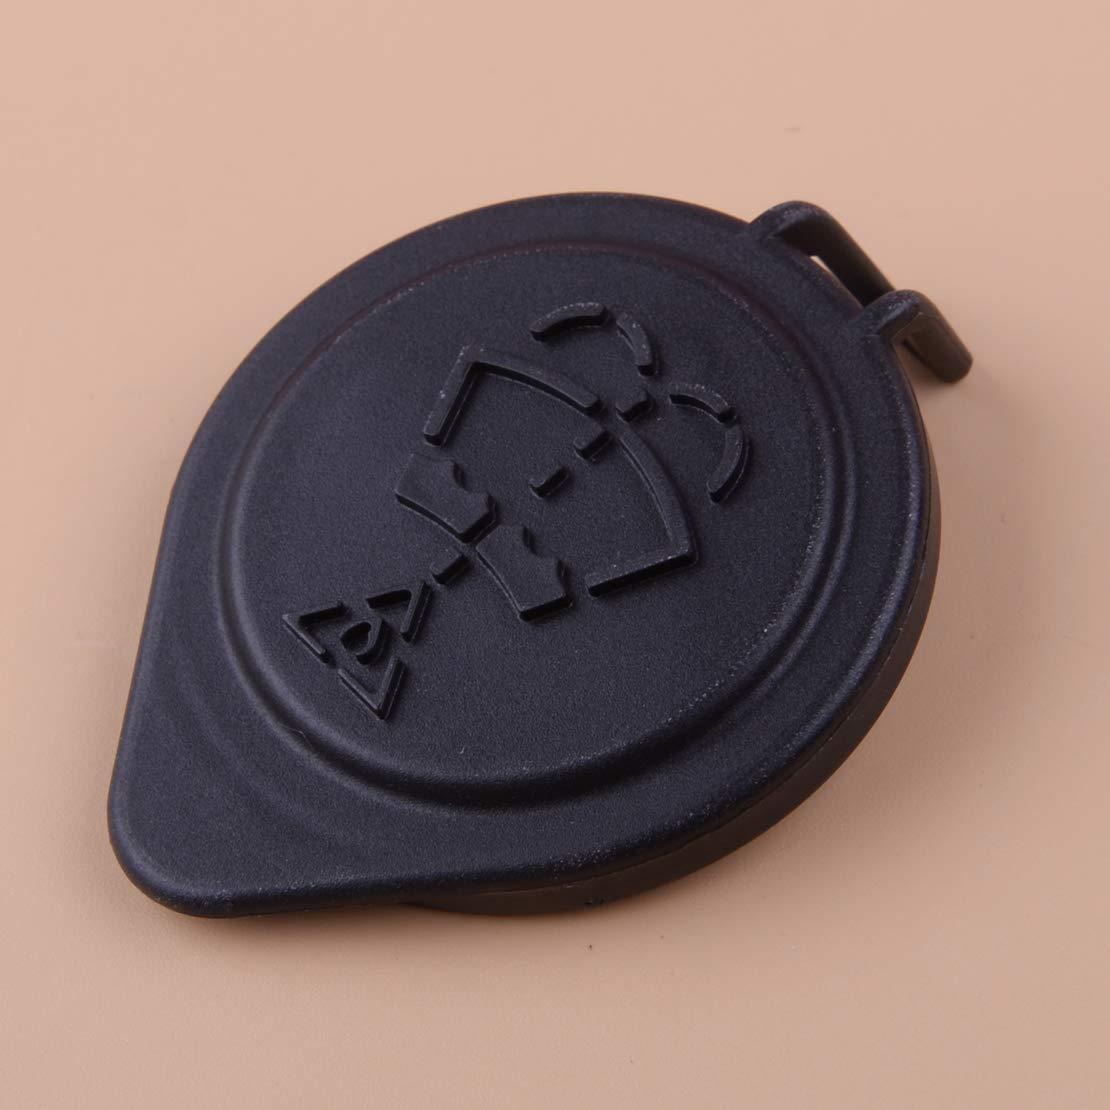 Windshield Washer Fluid Reservoir Tank Cap Fit For BMW 318is 128i 745i 535i 318i 61667264145